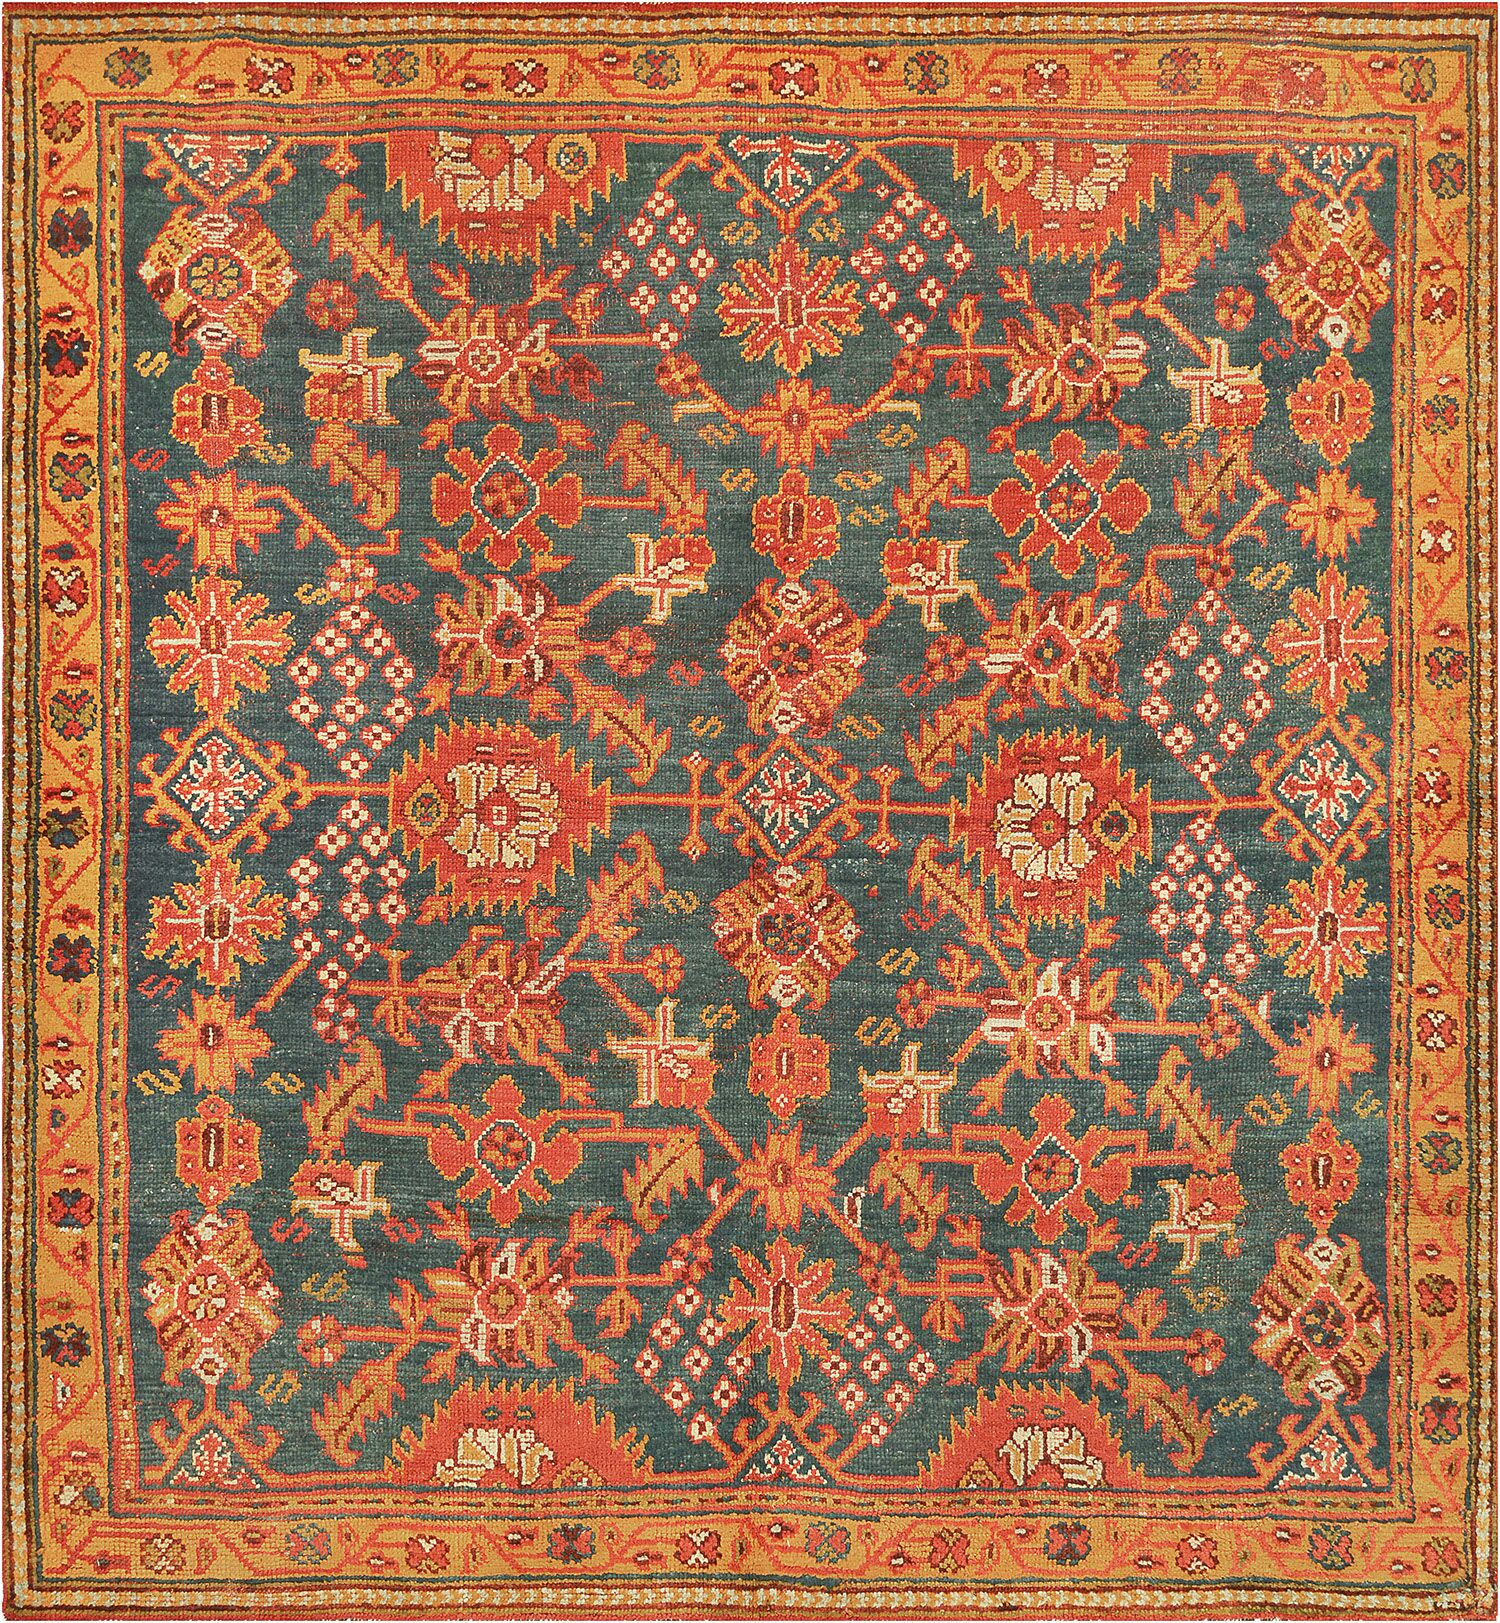 One-of-a-Kind Antique Oushak Handwoven Wool Teal/Orange Indoor Area Rug